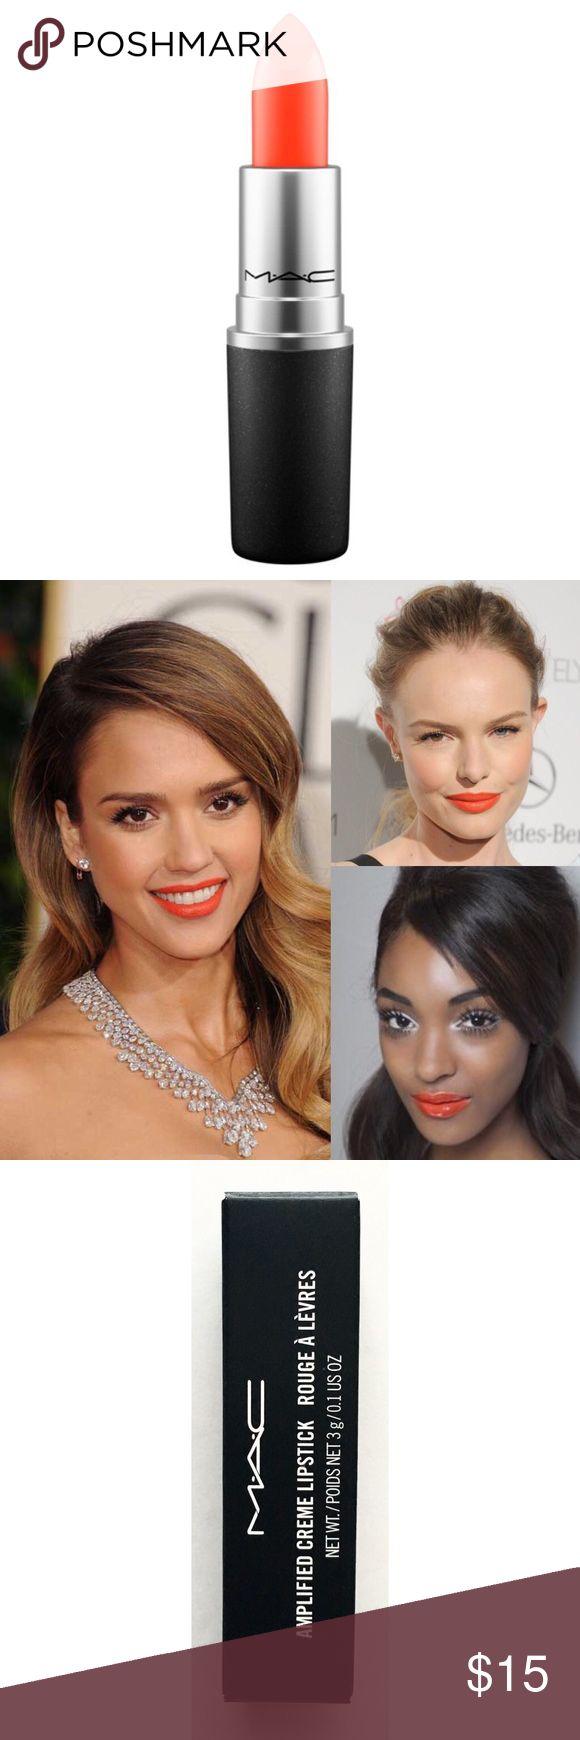 MAC — Amplified Creme Lipstick in Morange MAC — Amplified Creme Lipstick in Morange • NIB • NEVER USED MAC Cosmetics Makeup Lipstick